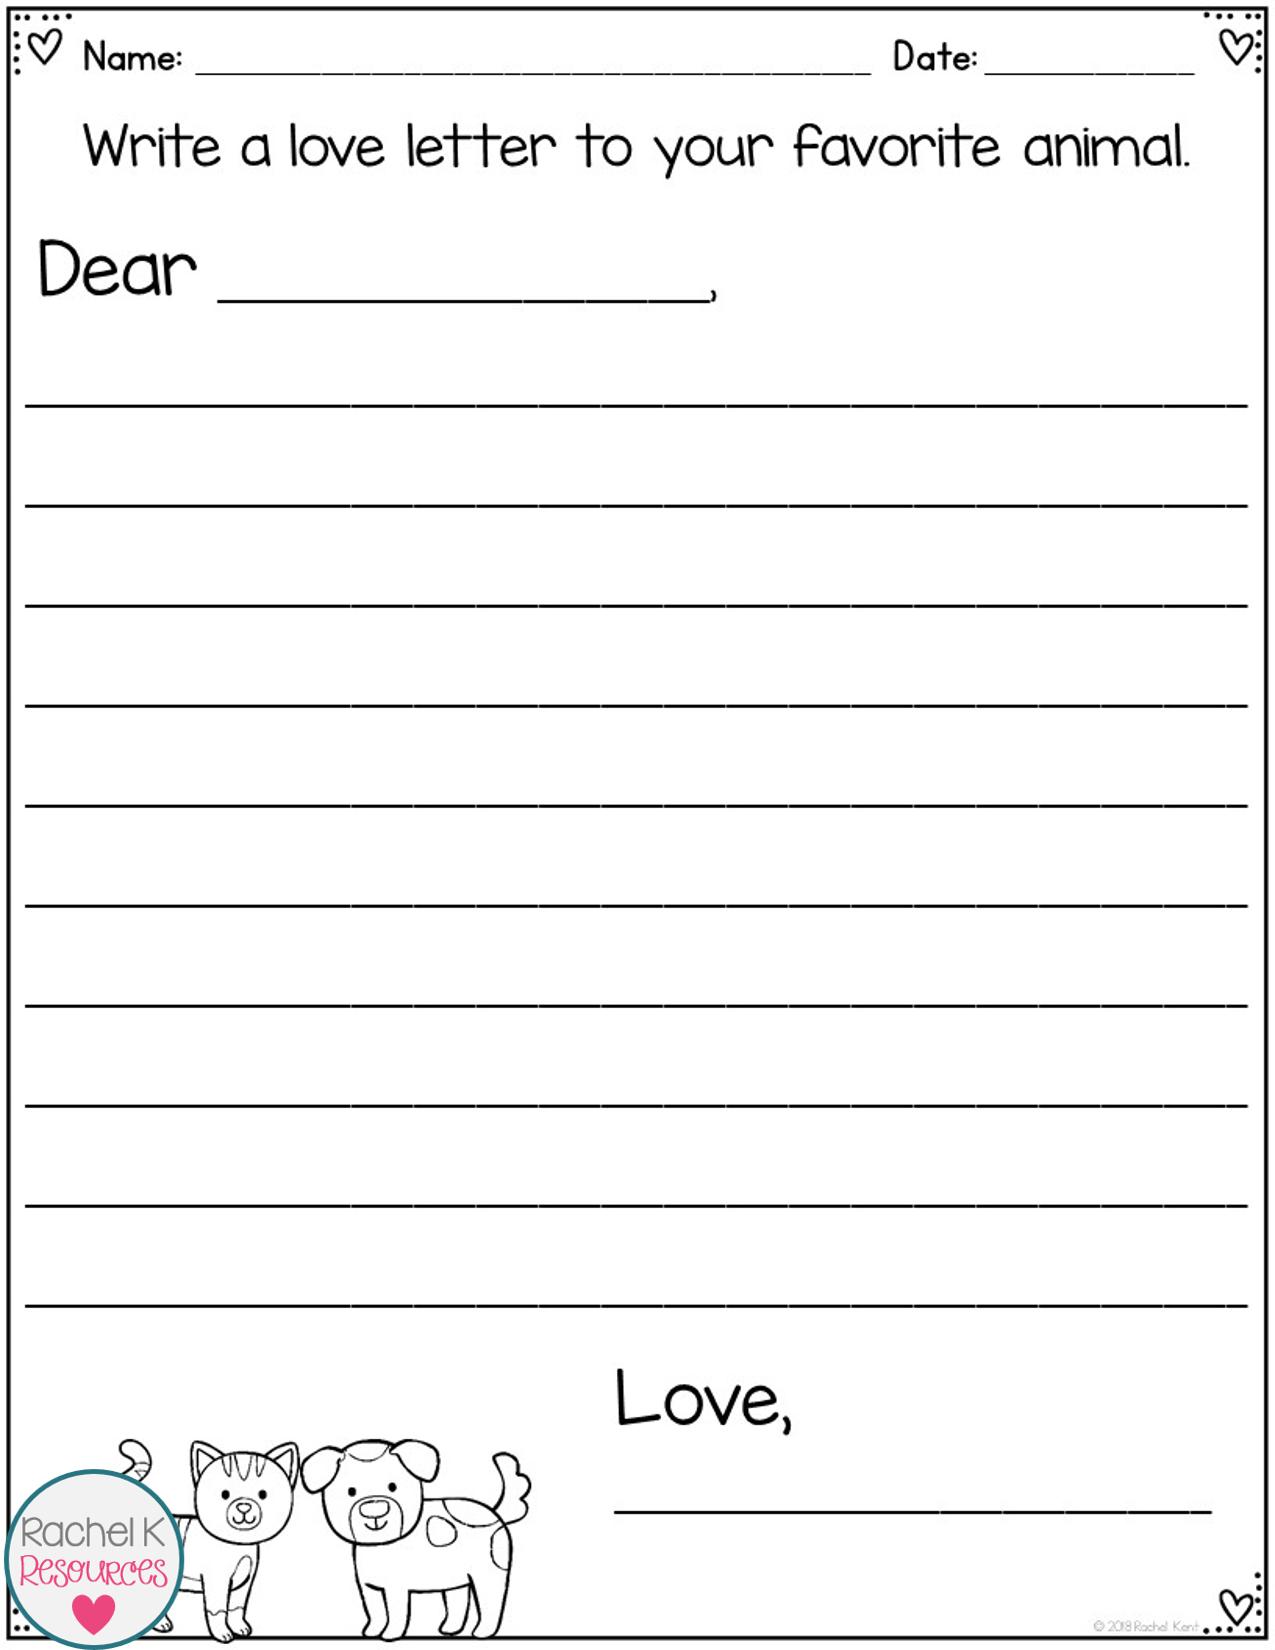 Valentine's Day Writing Activities Writing activities